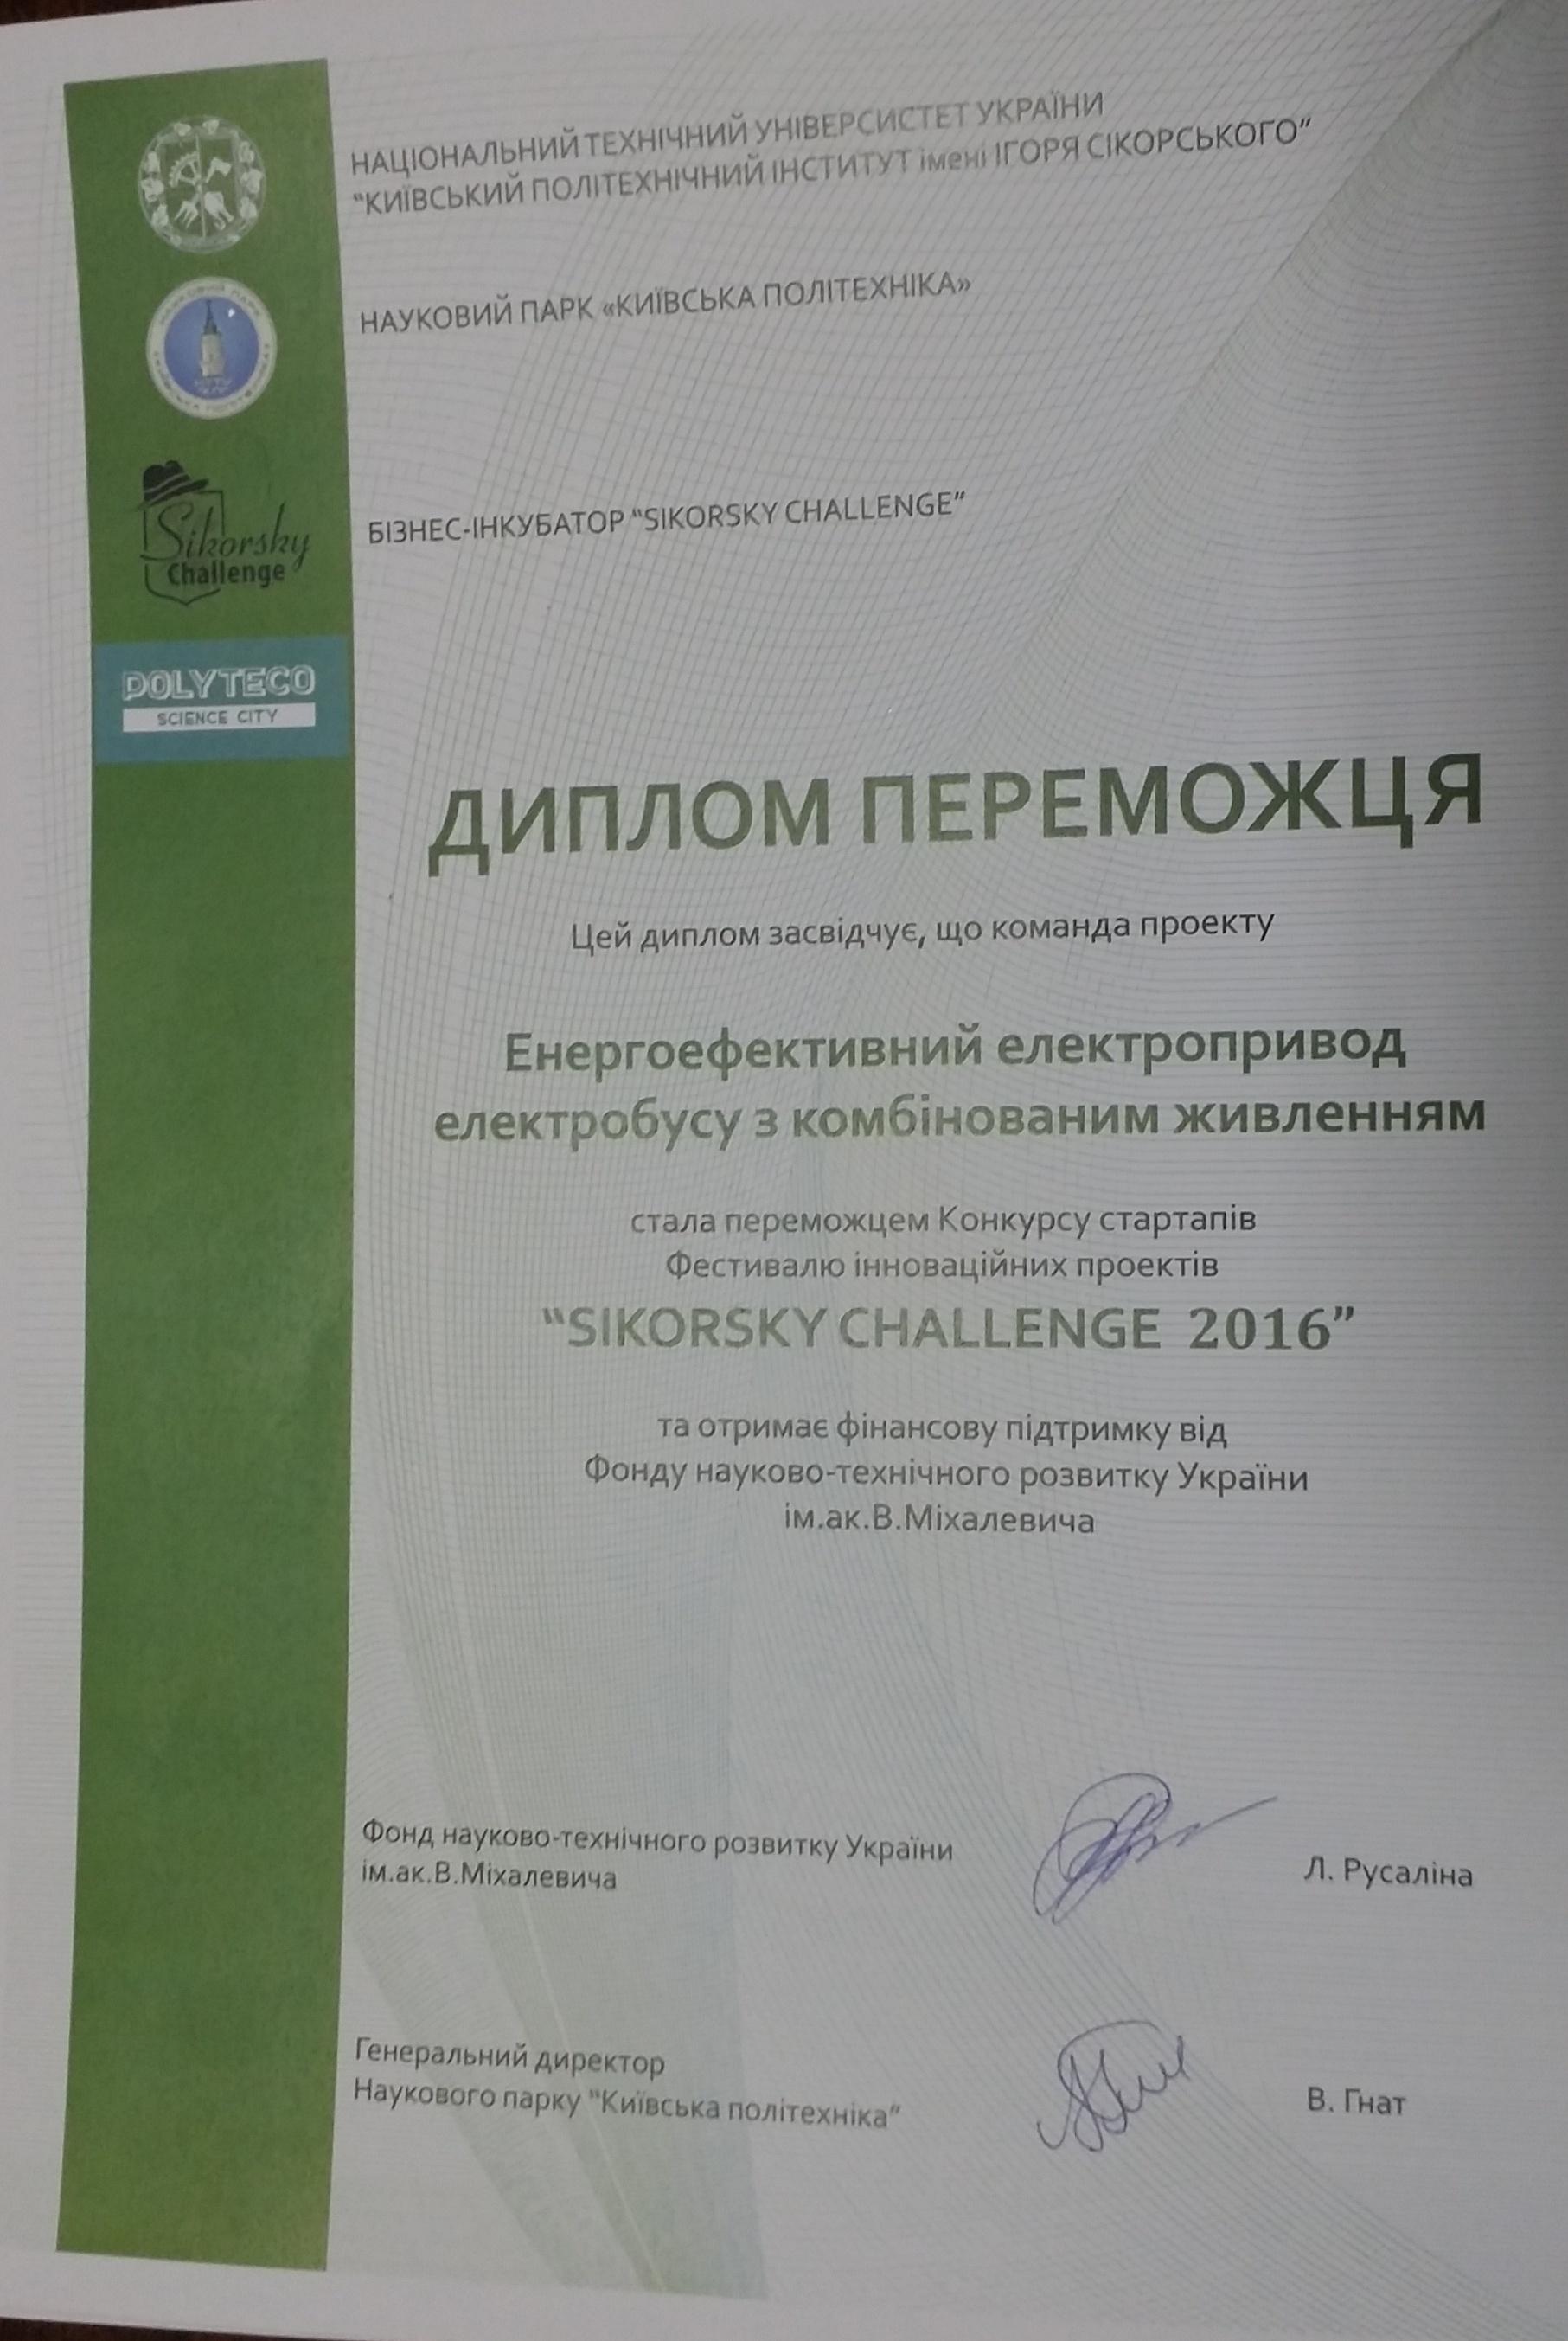 Перемога в конкурсі Sikorsky Challenge 2016 кафедри АЕМС-еп